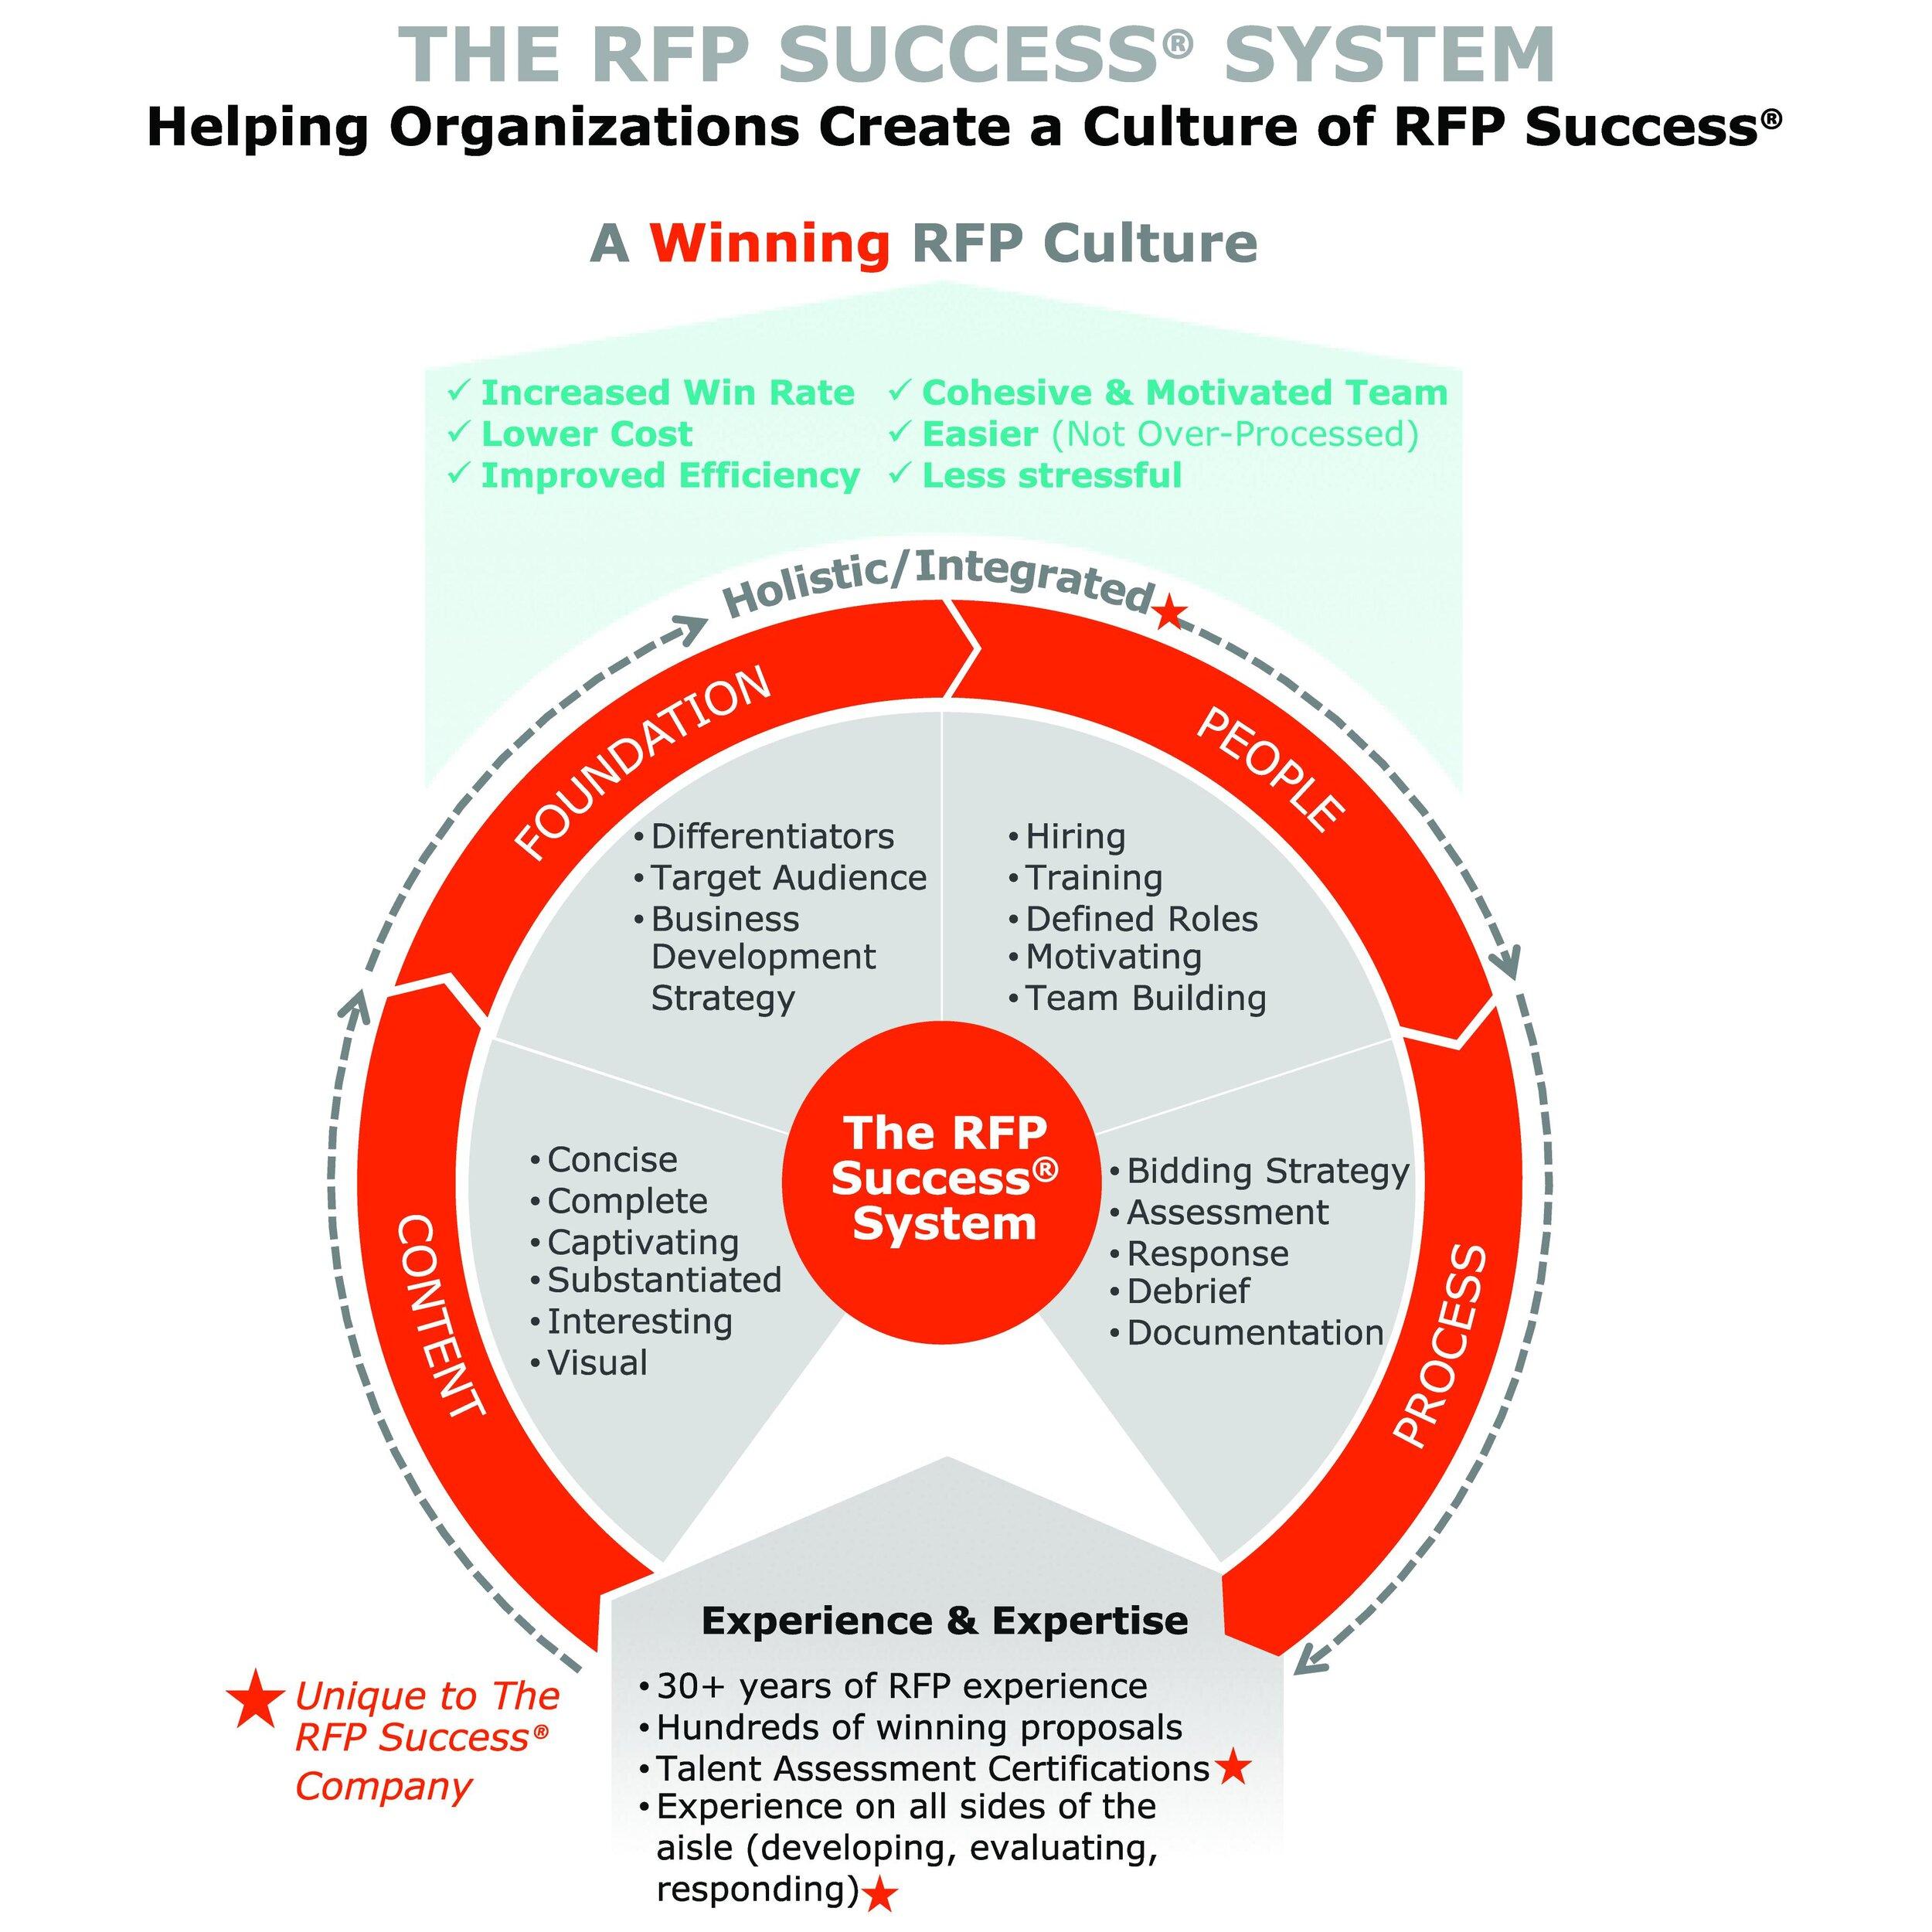 The RFP Success Sytem.jpg